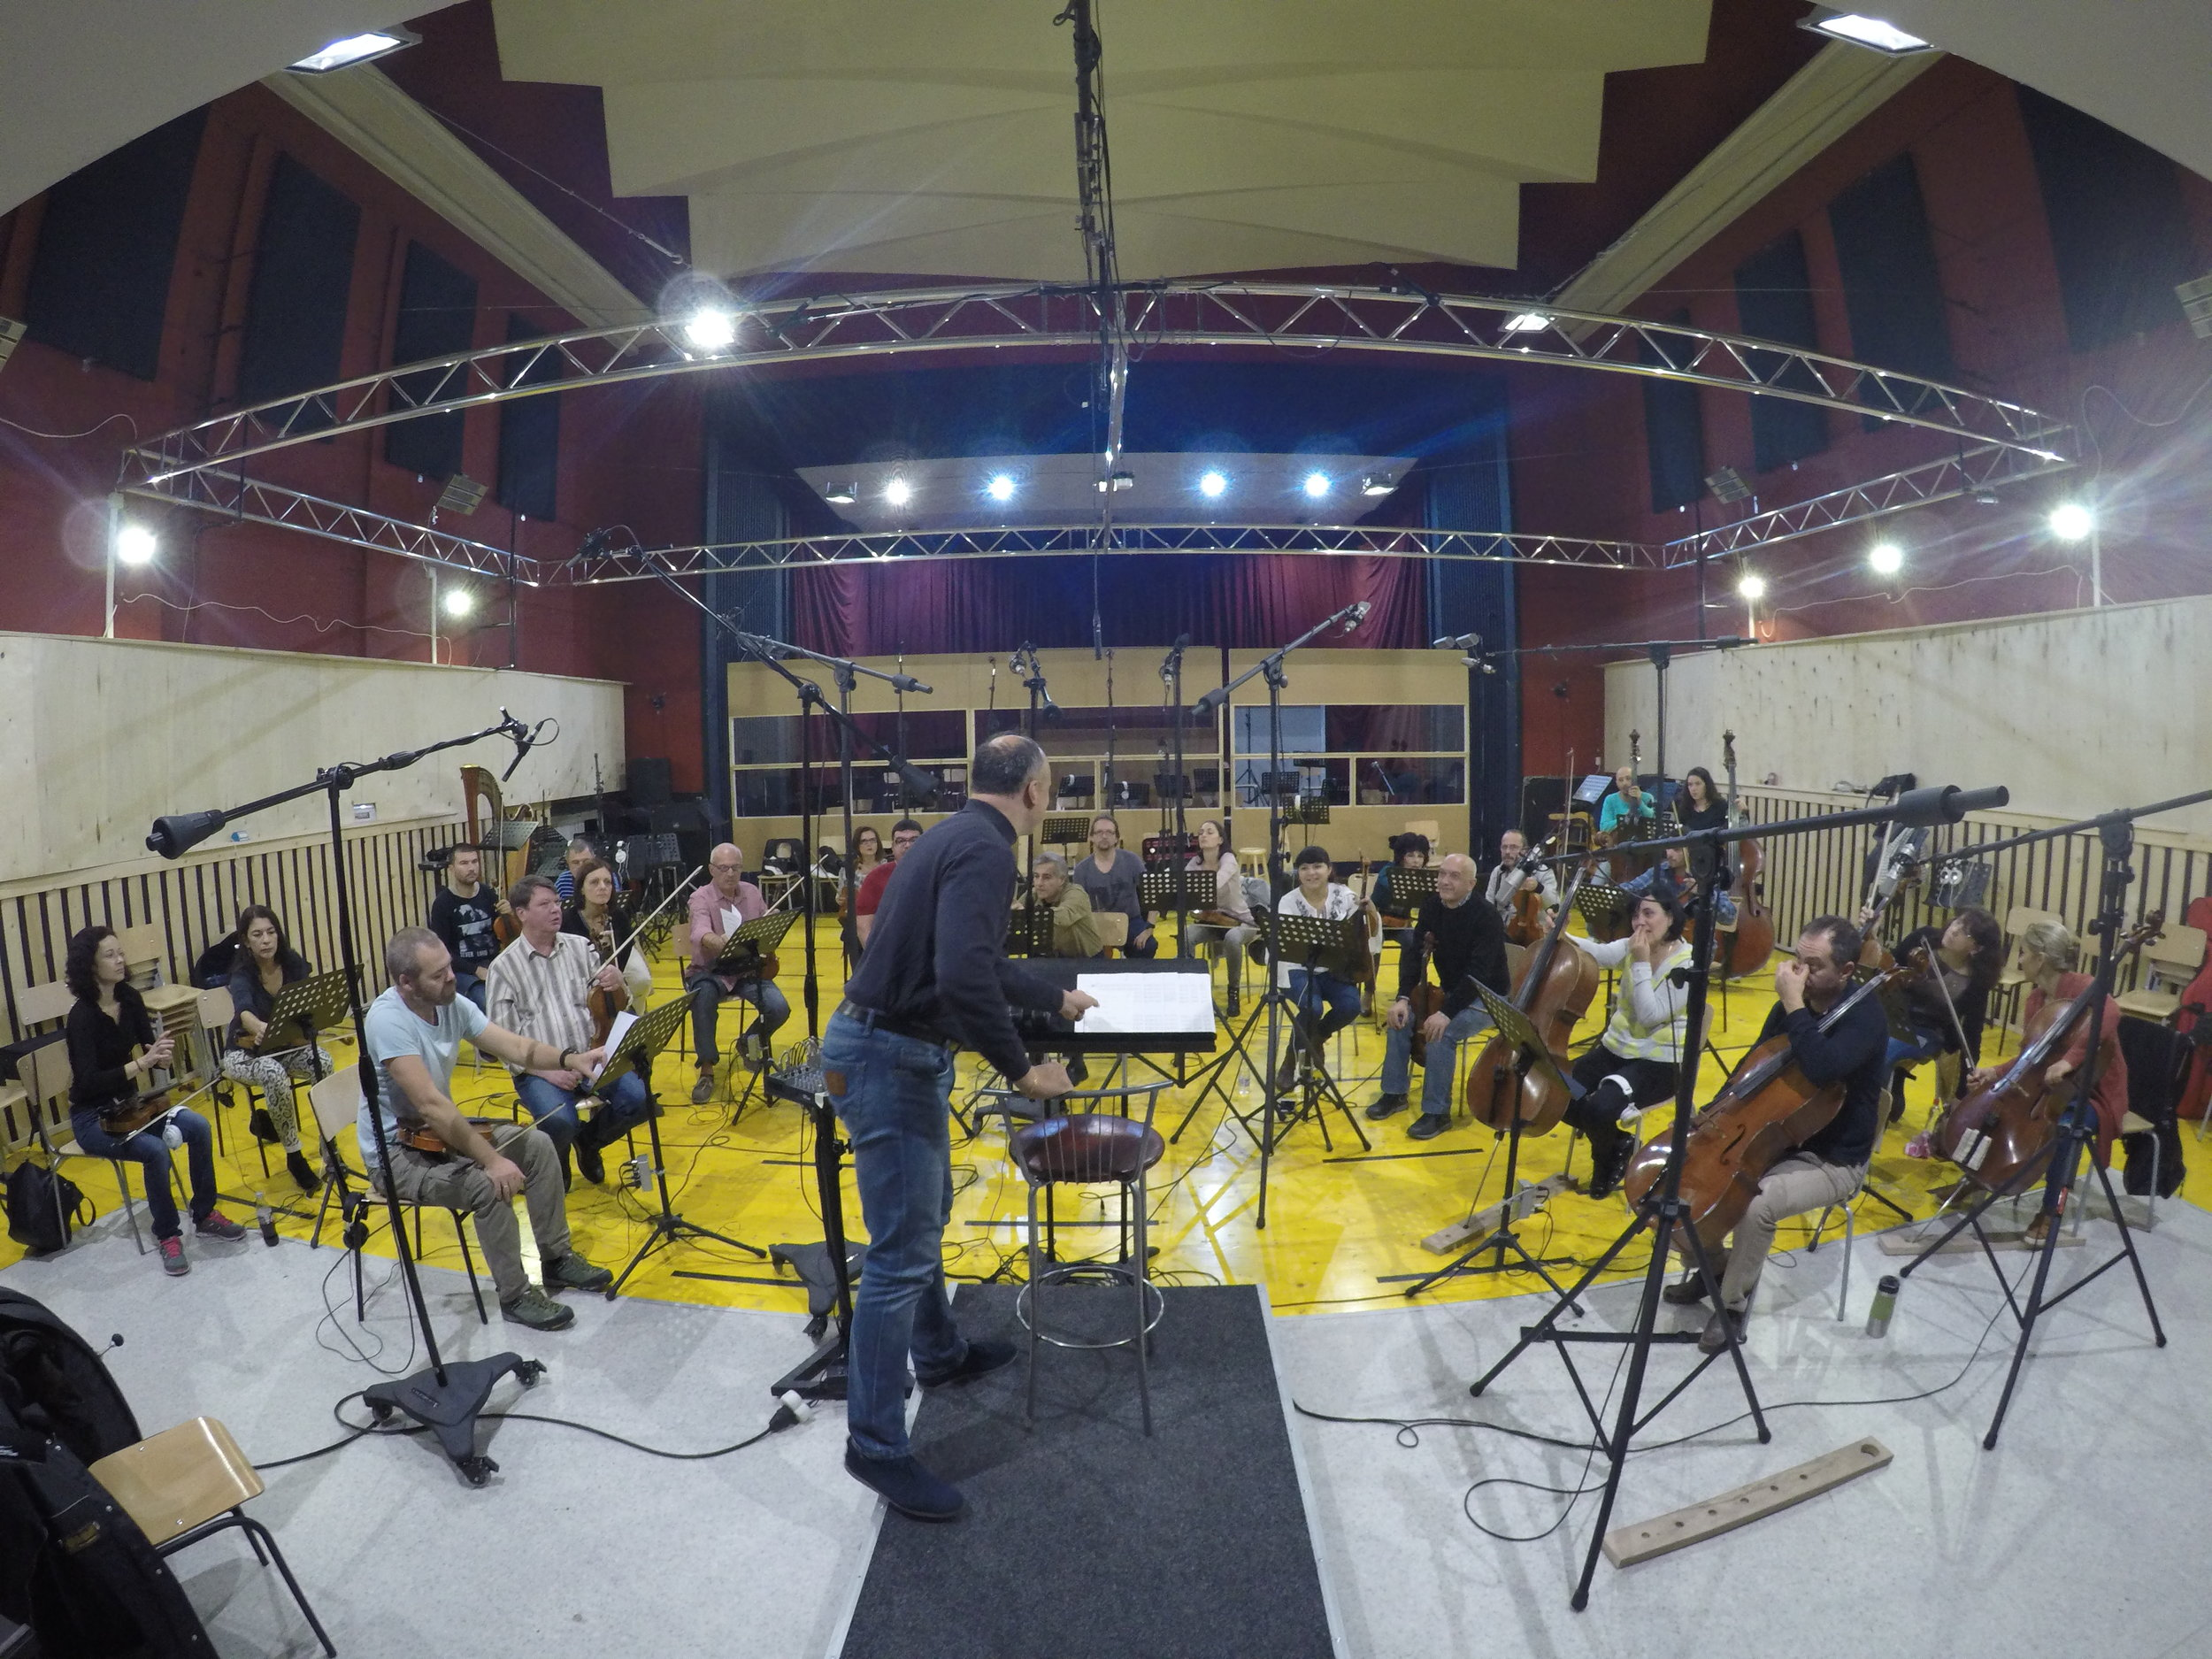 The Vitosha Philharmonic Orchestra, Sofia, Bulgaria - Conducted by Grigor Palikarov